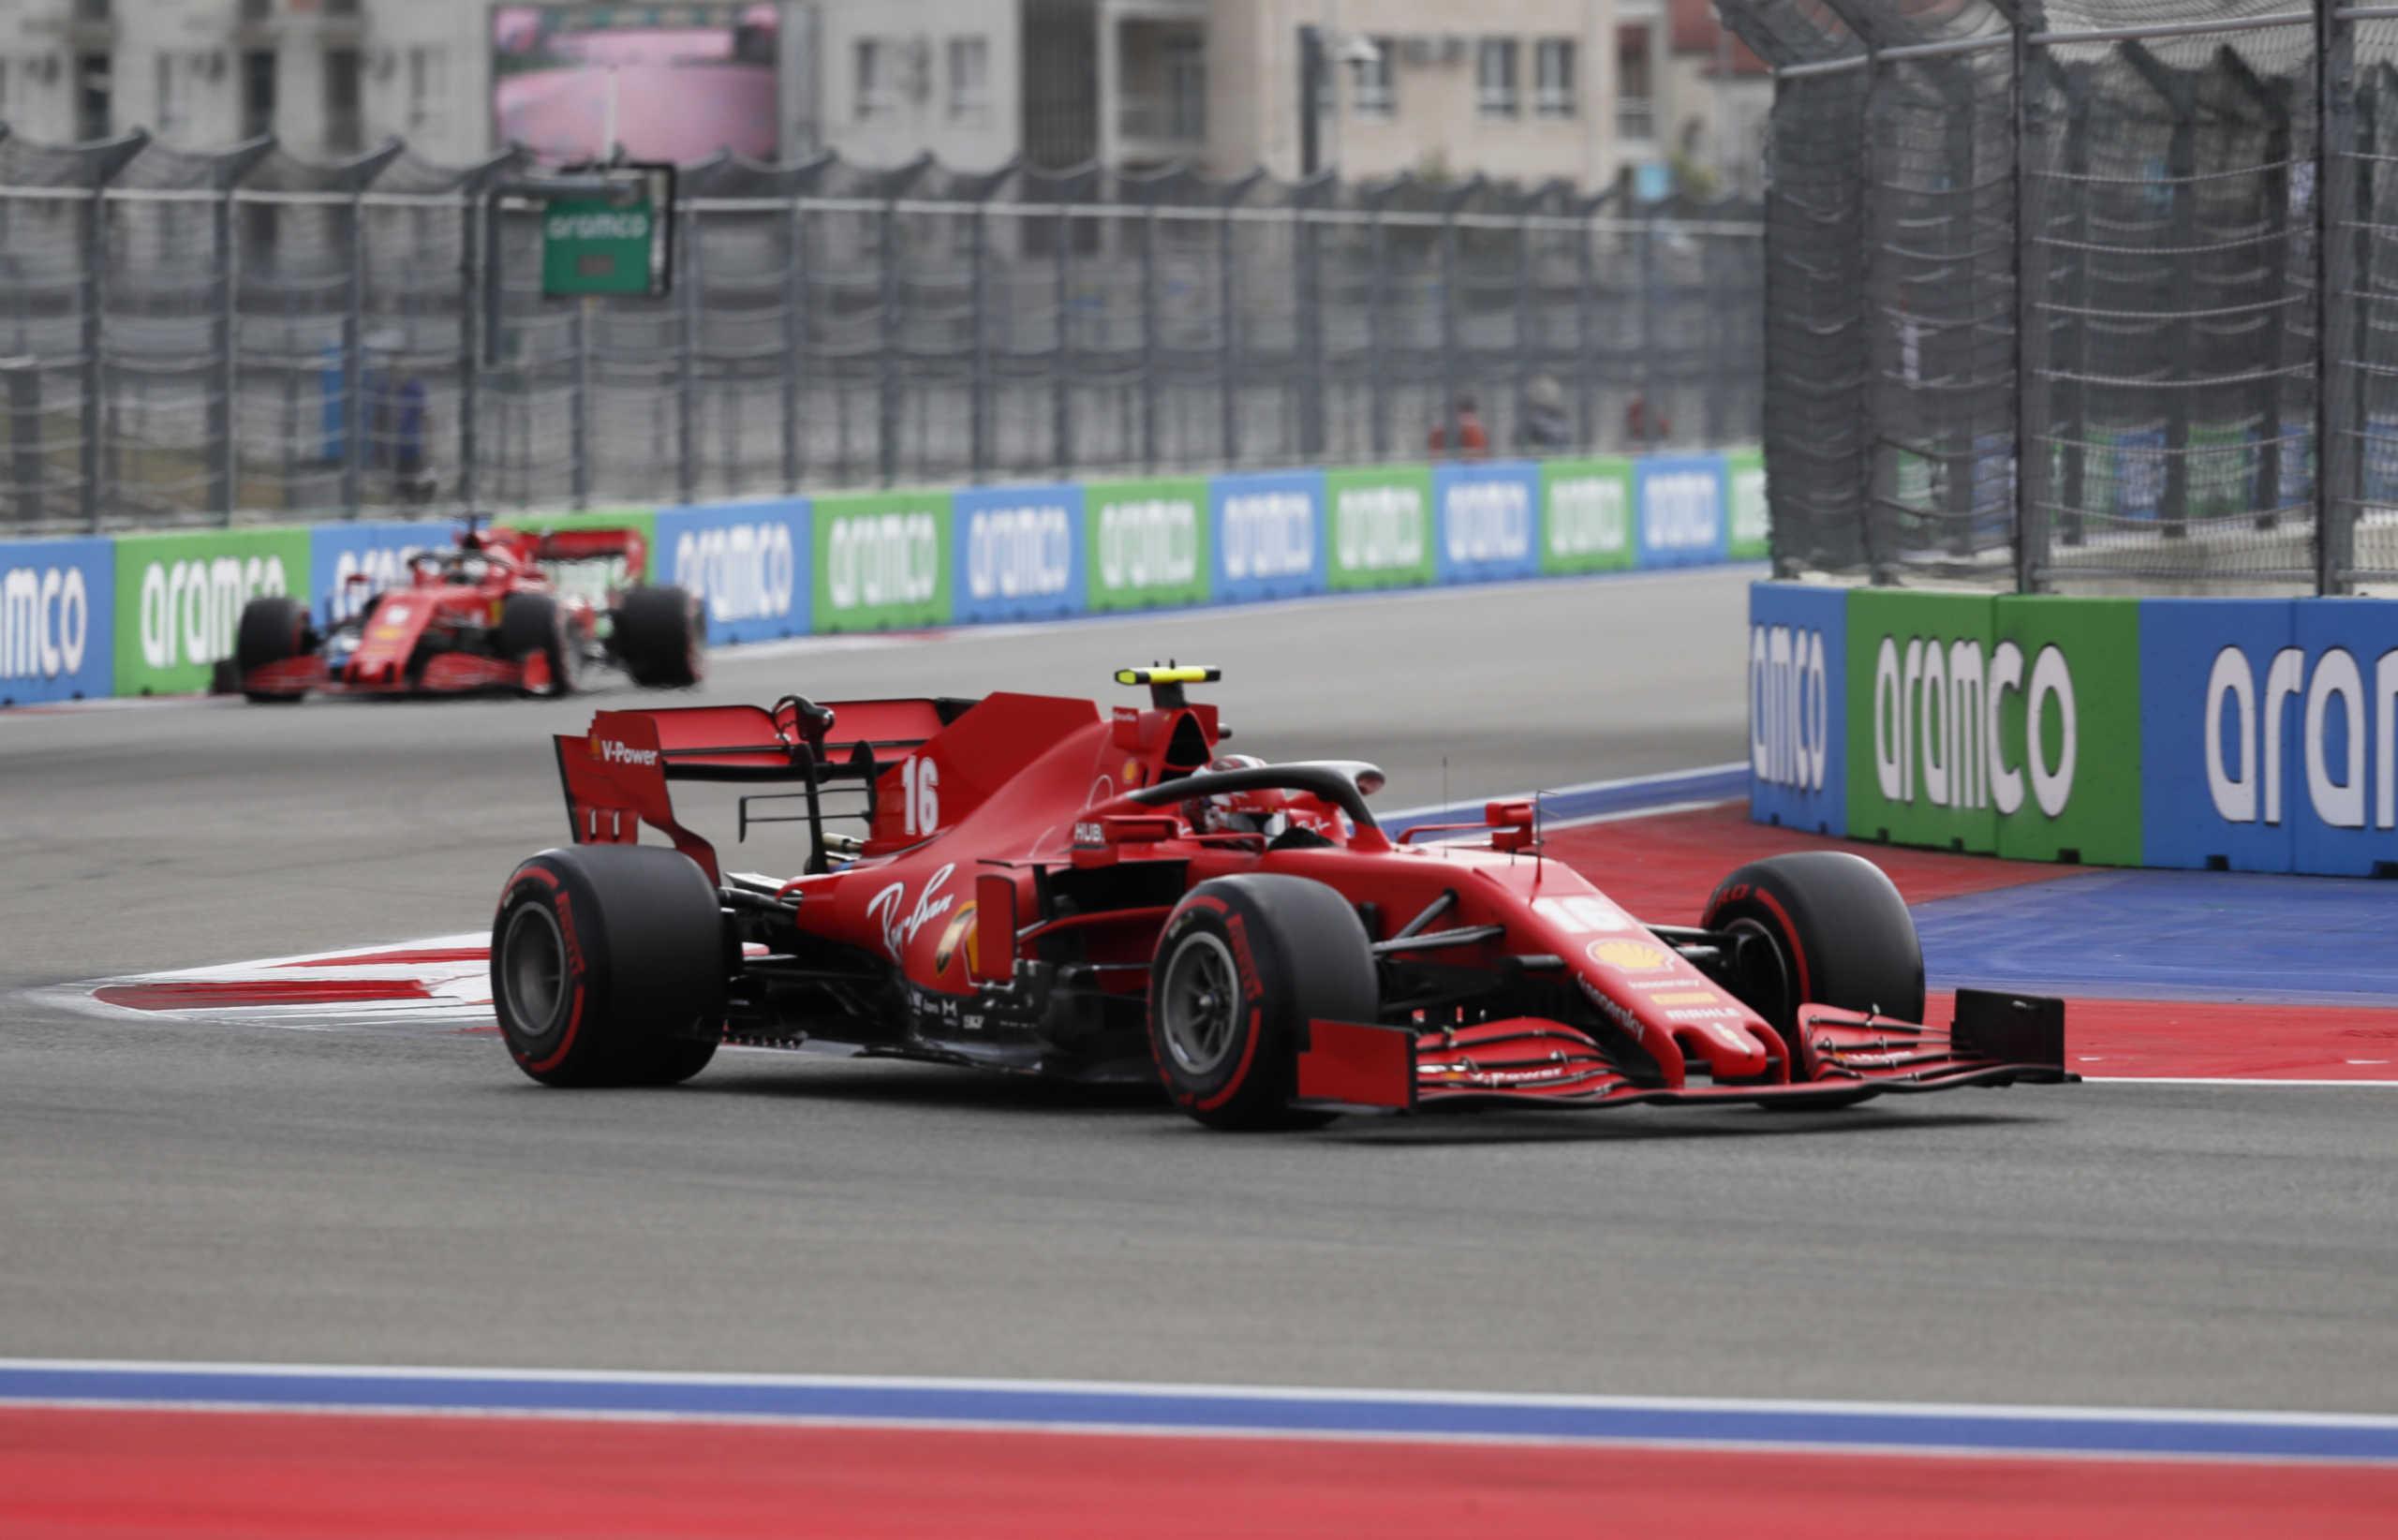 Formula 1: Τραγέλαφος ξανά η Ferrari! O Φέτελ διέλυσε το μονοθέσιό του και παραλίγο να τρακάρει με τον Λεκλέρκ (video)